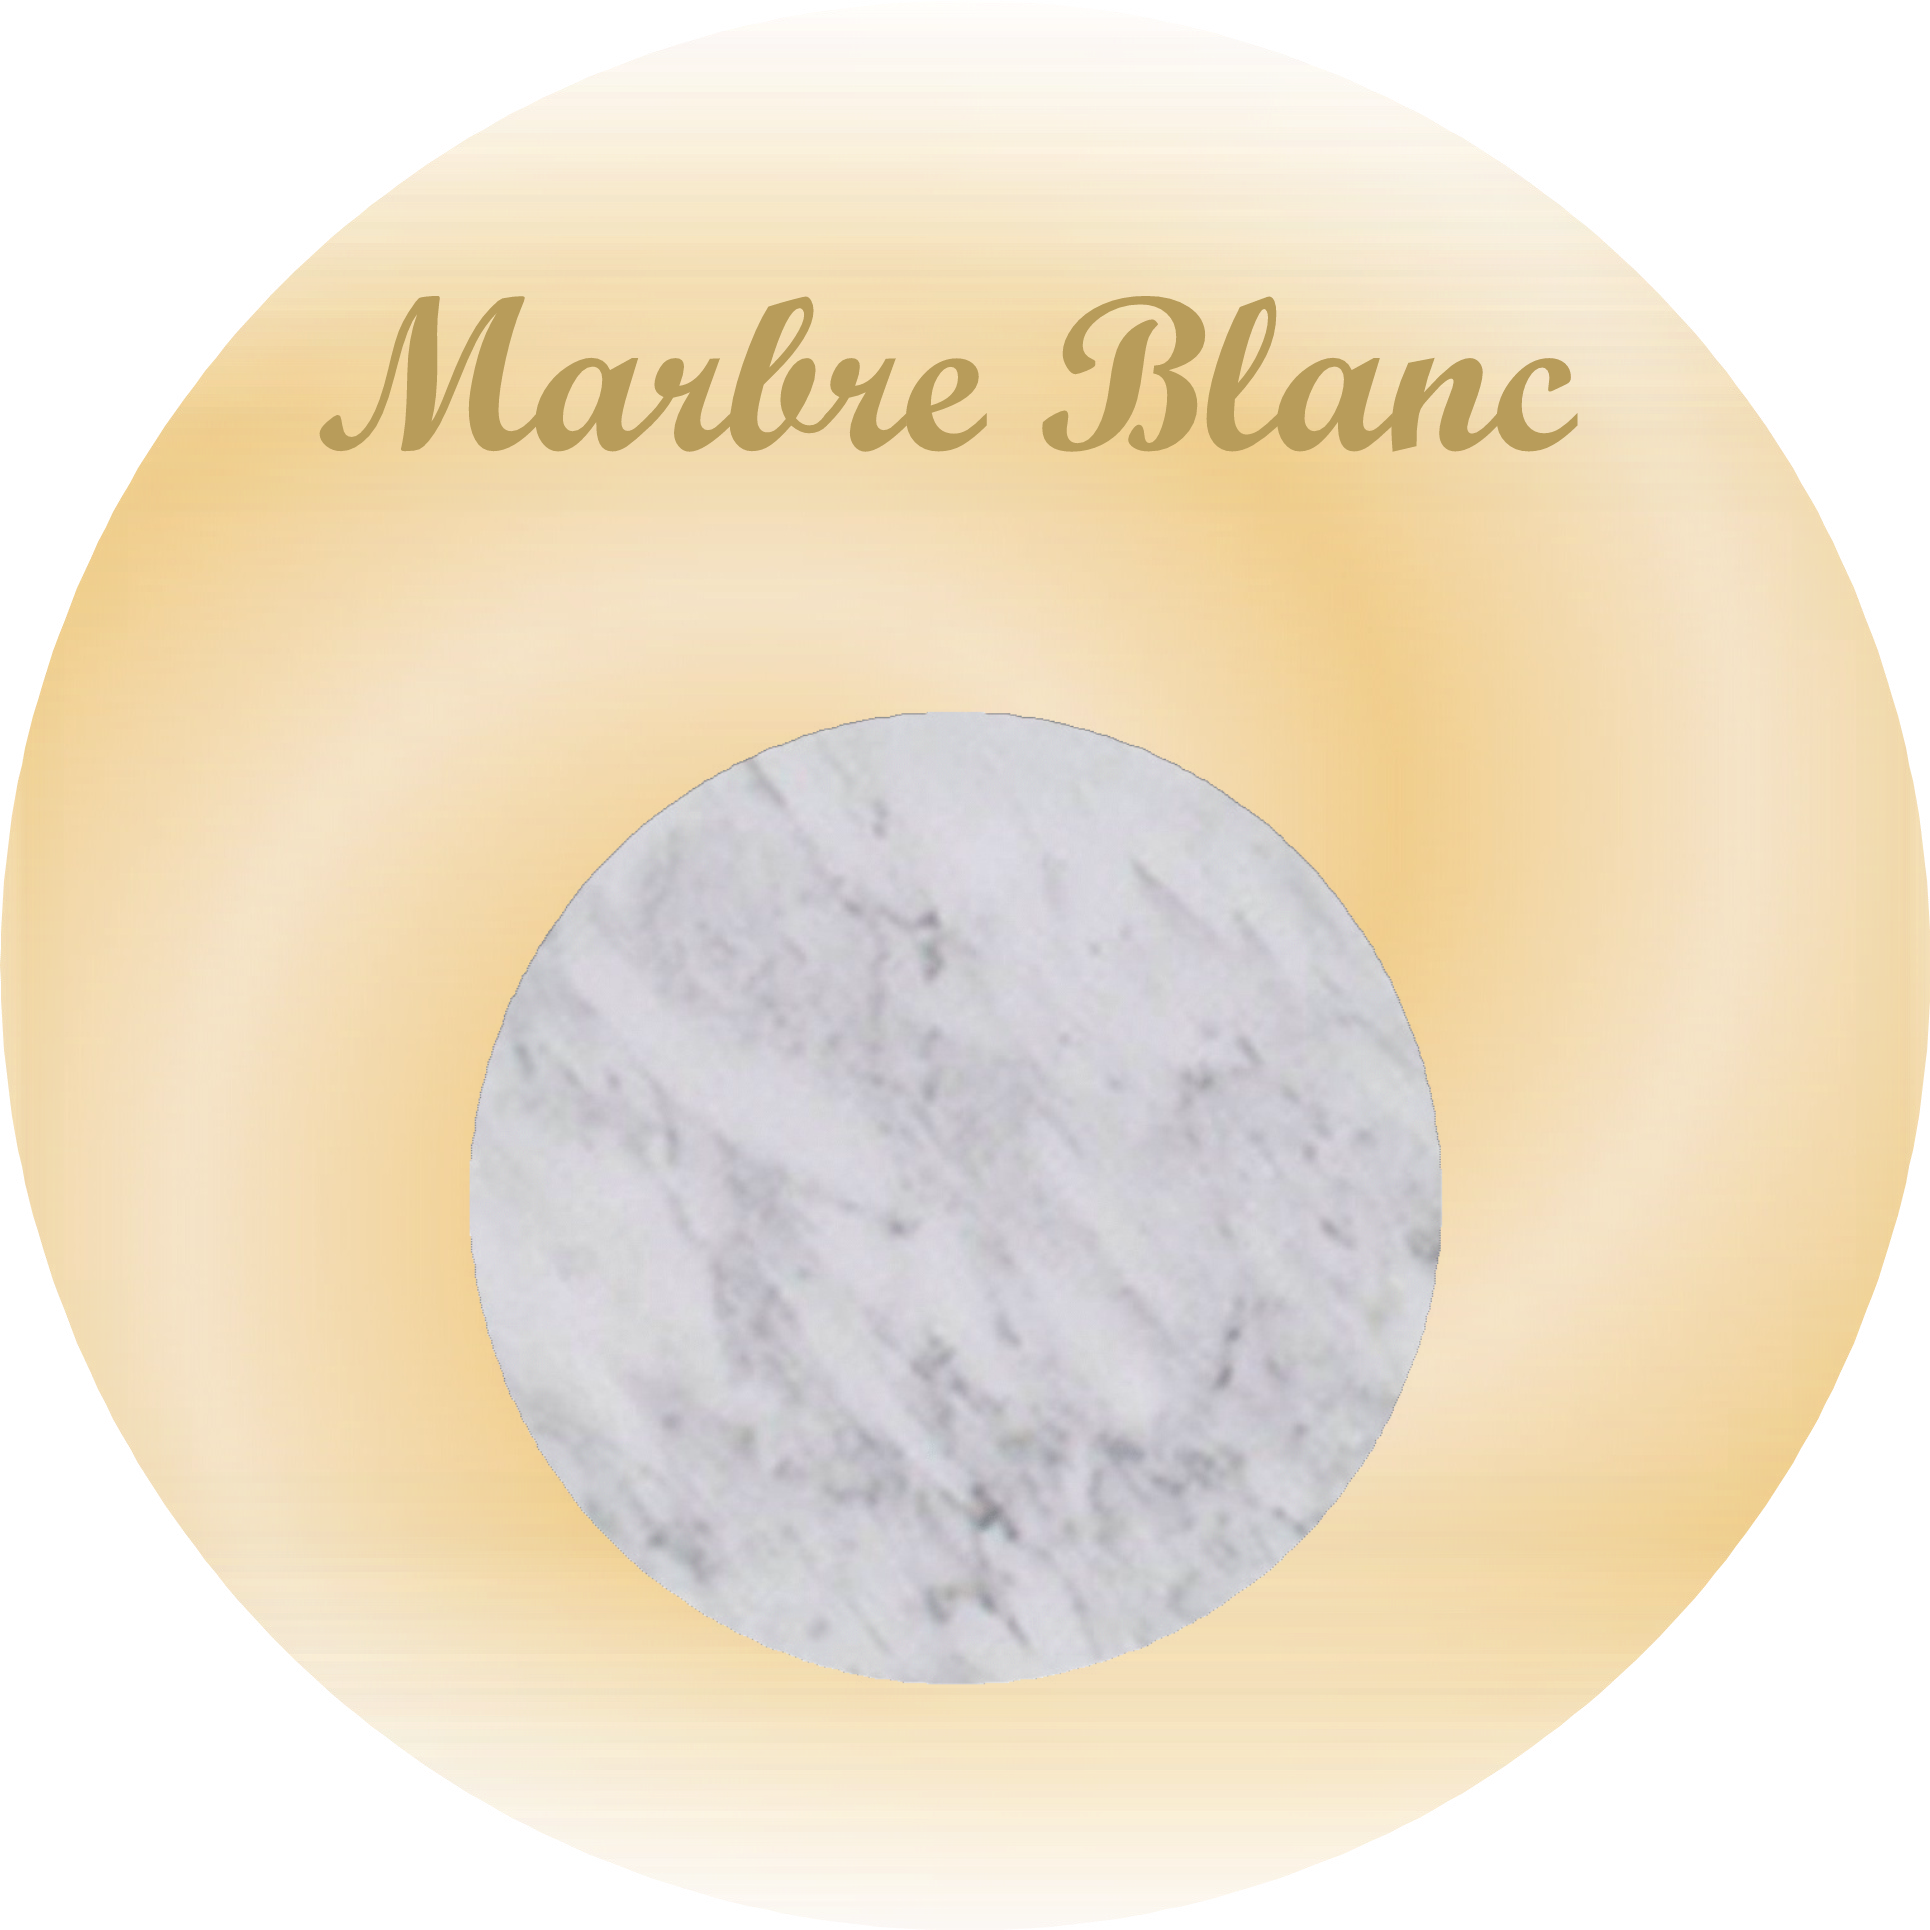 plaques rectangulaire granit marbre blanc